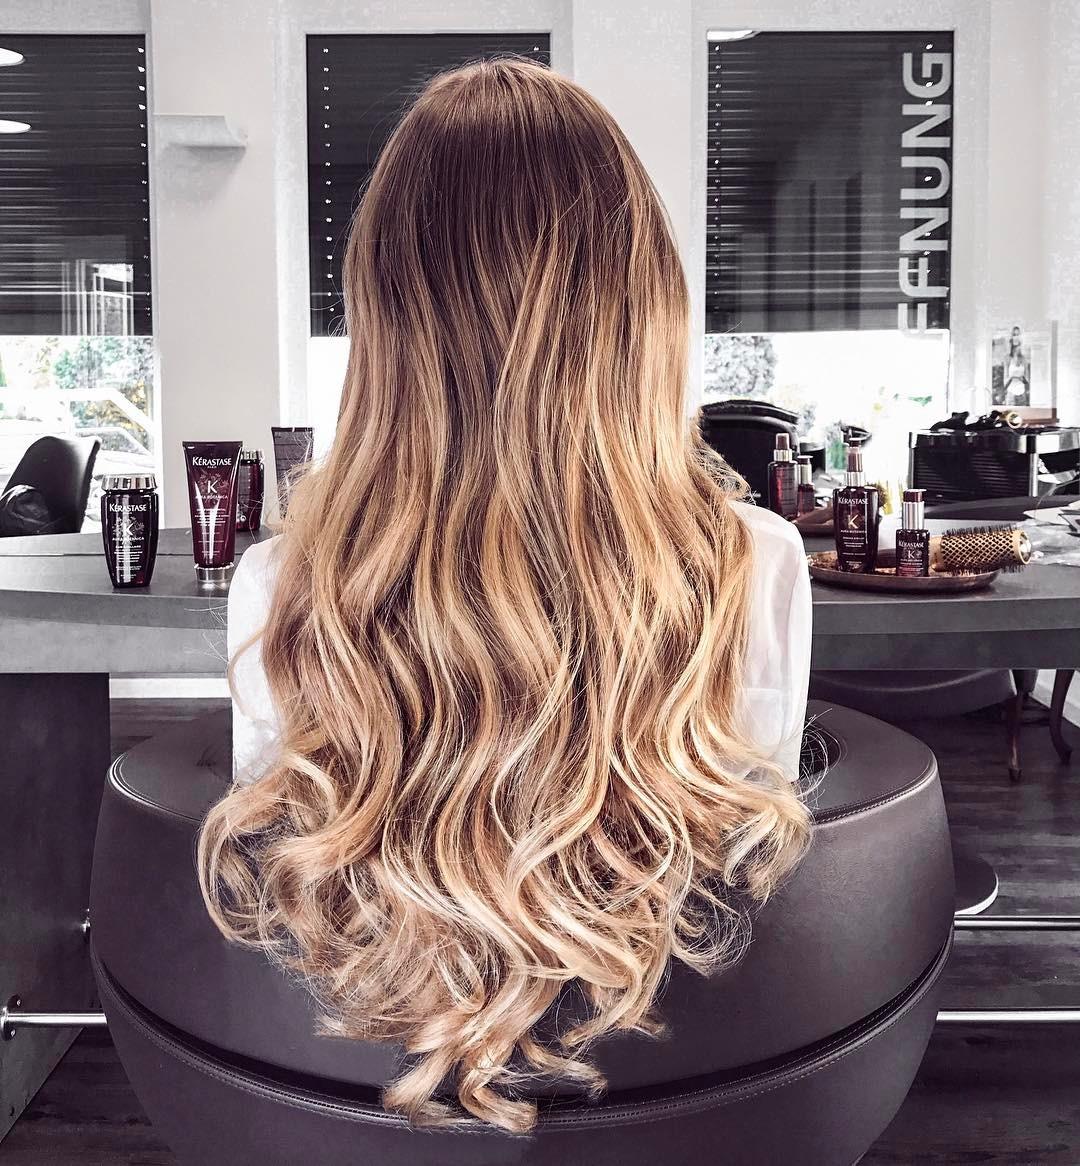 Pin by lauren hamilton on hair pinterest hair style hair goals